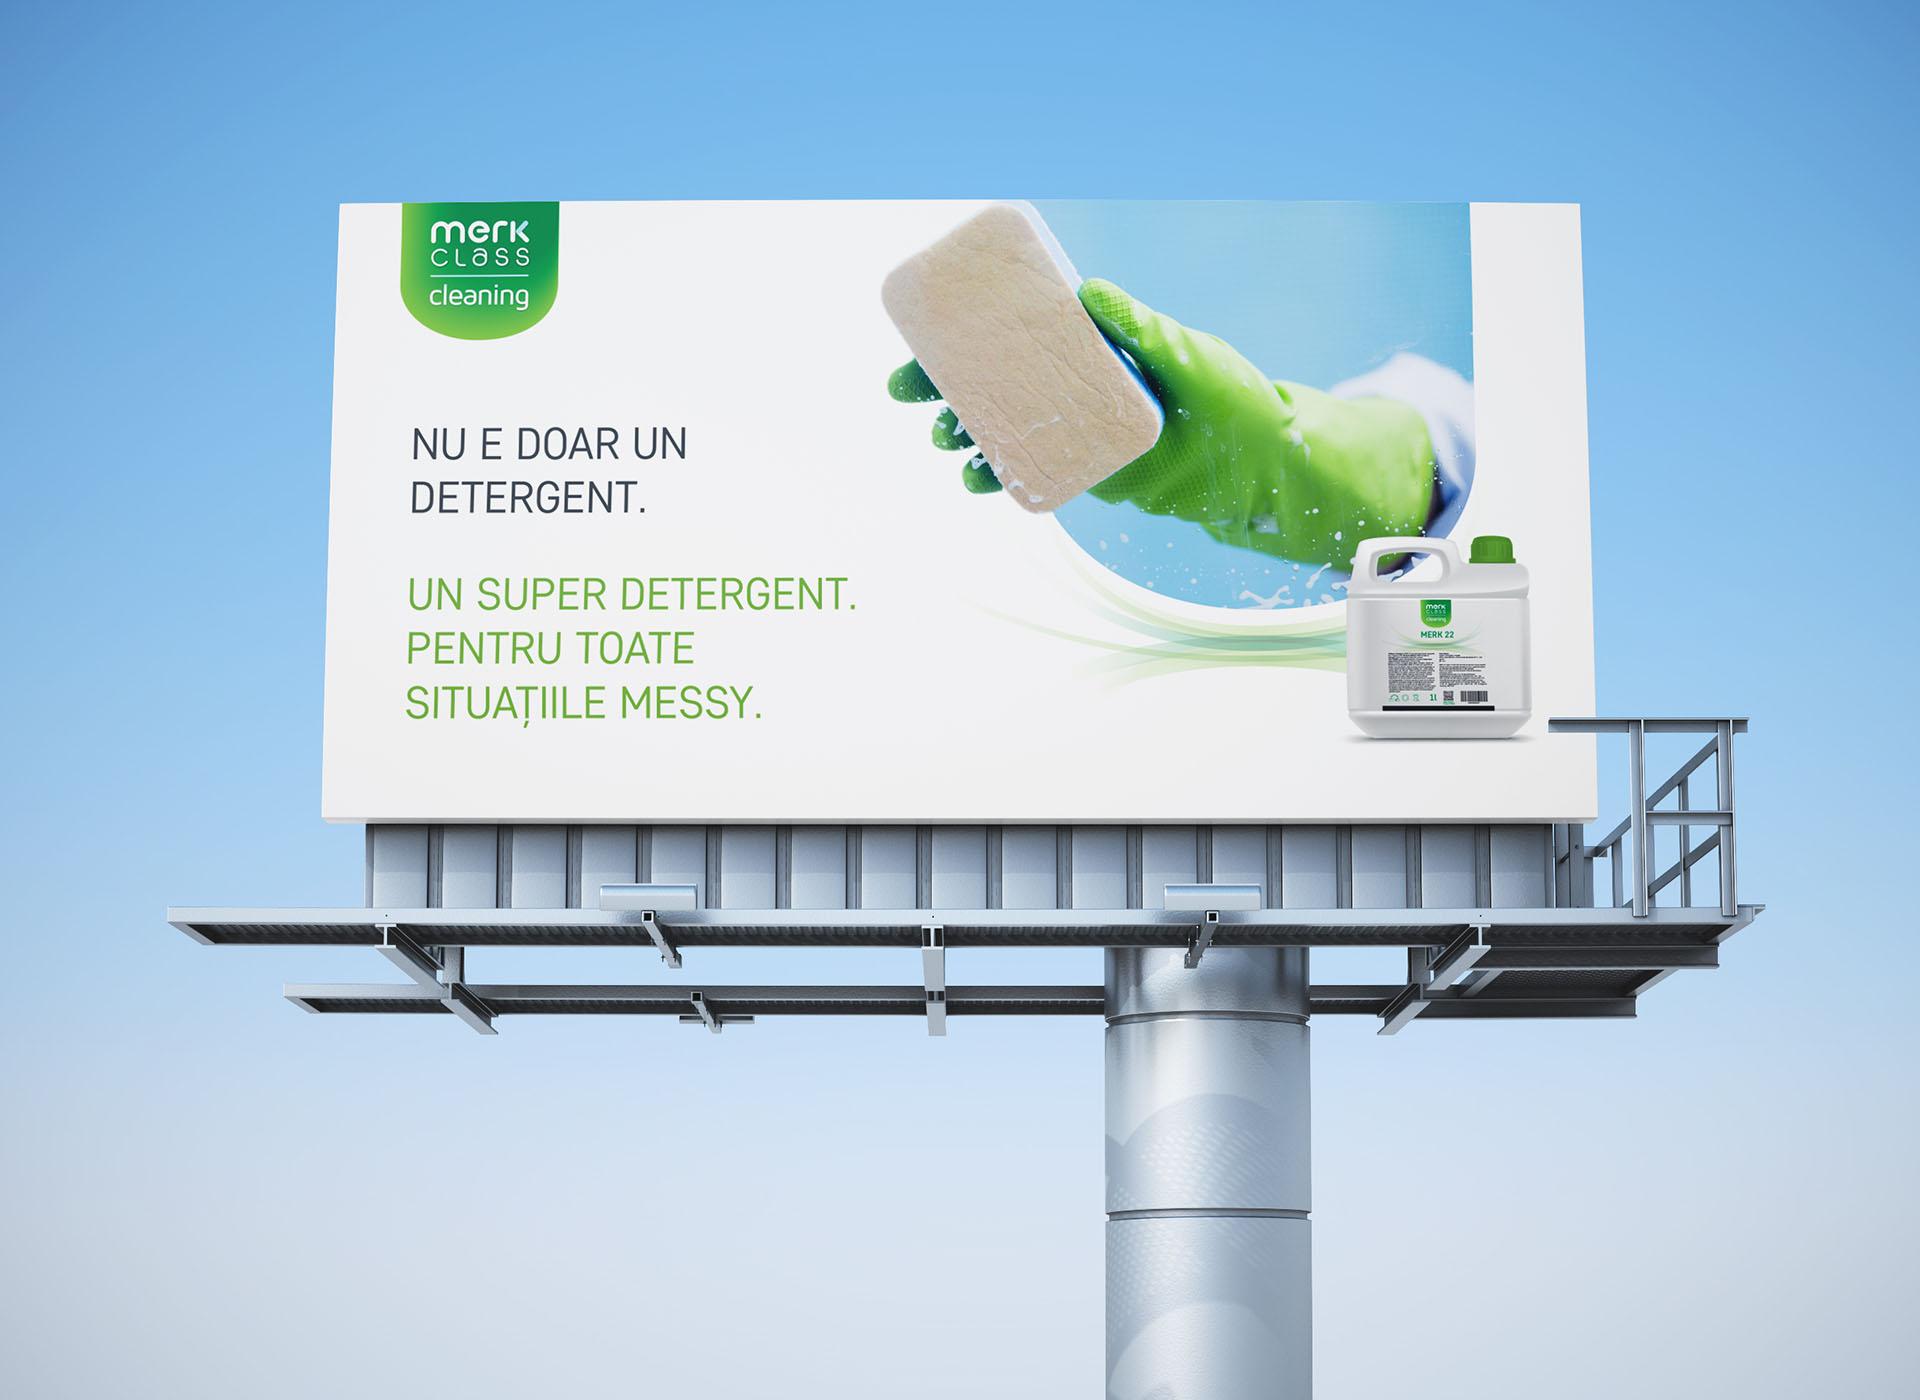 merk class portfolio inoveo billboard